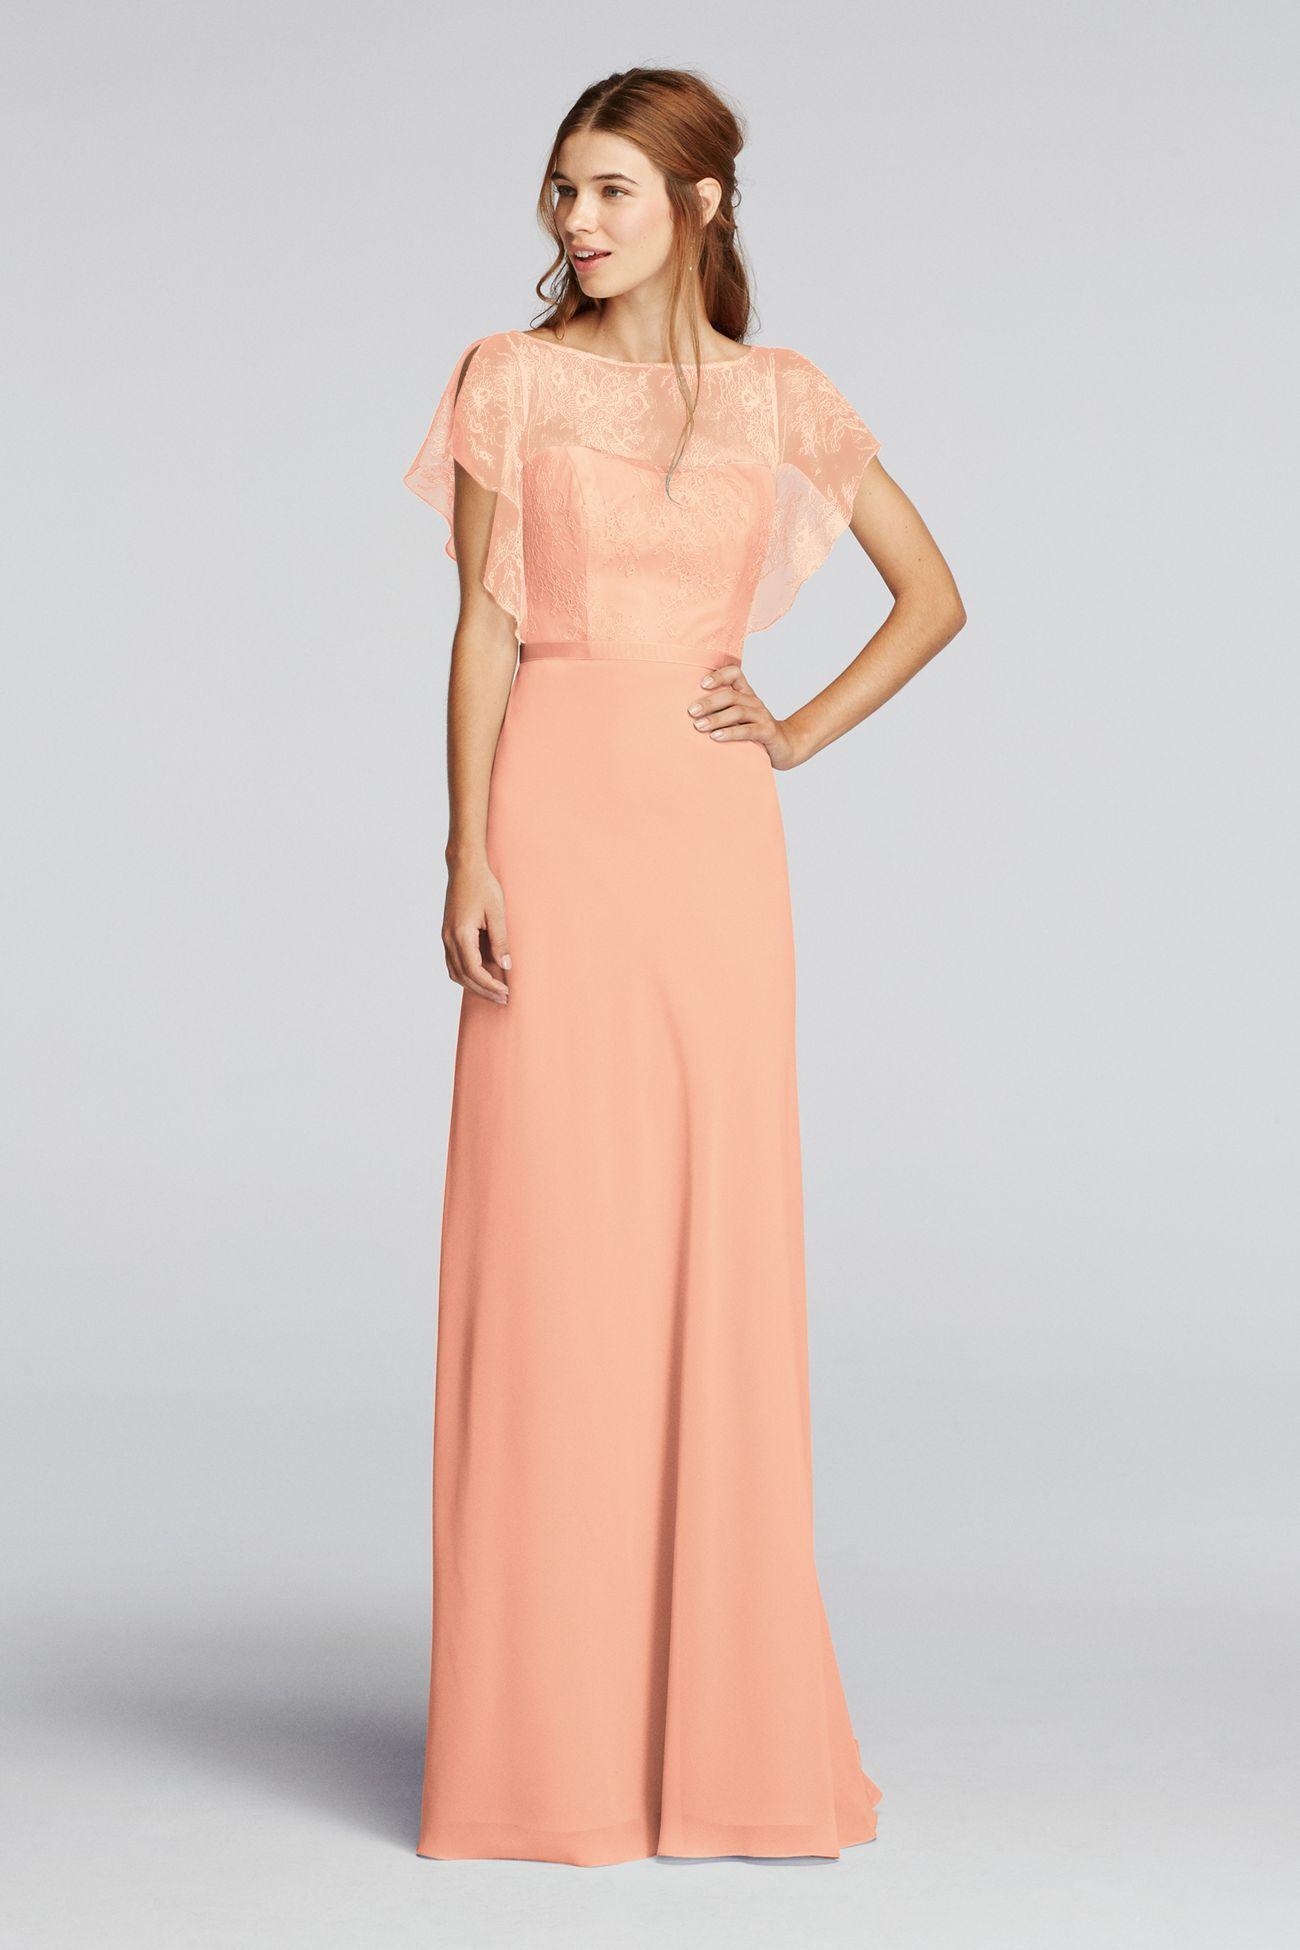 My New Favorite! www.davidsbridal.com/10504697 | Ring dance dress ...